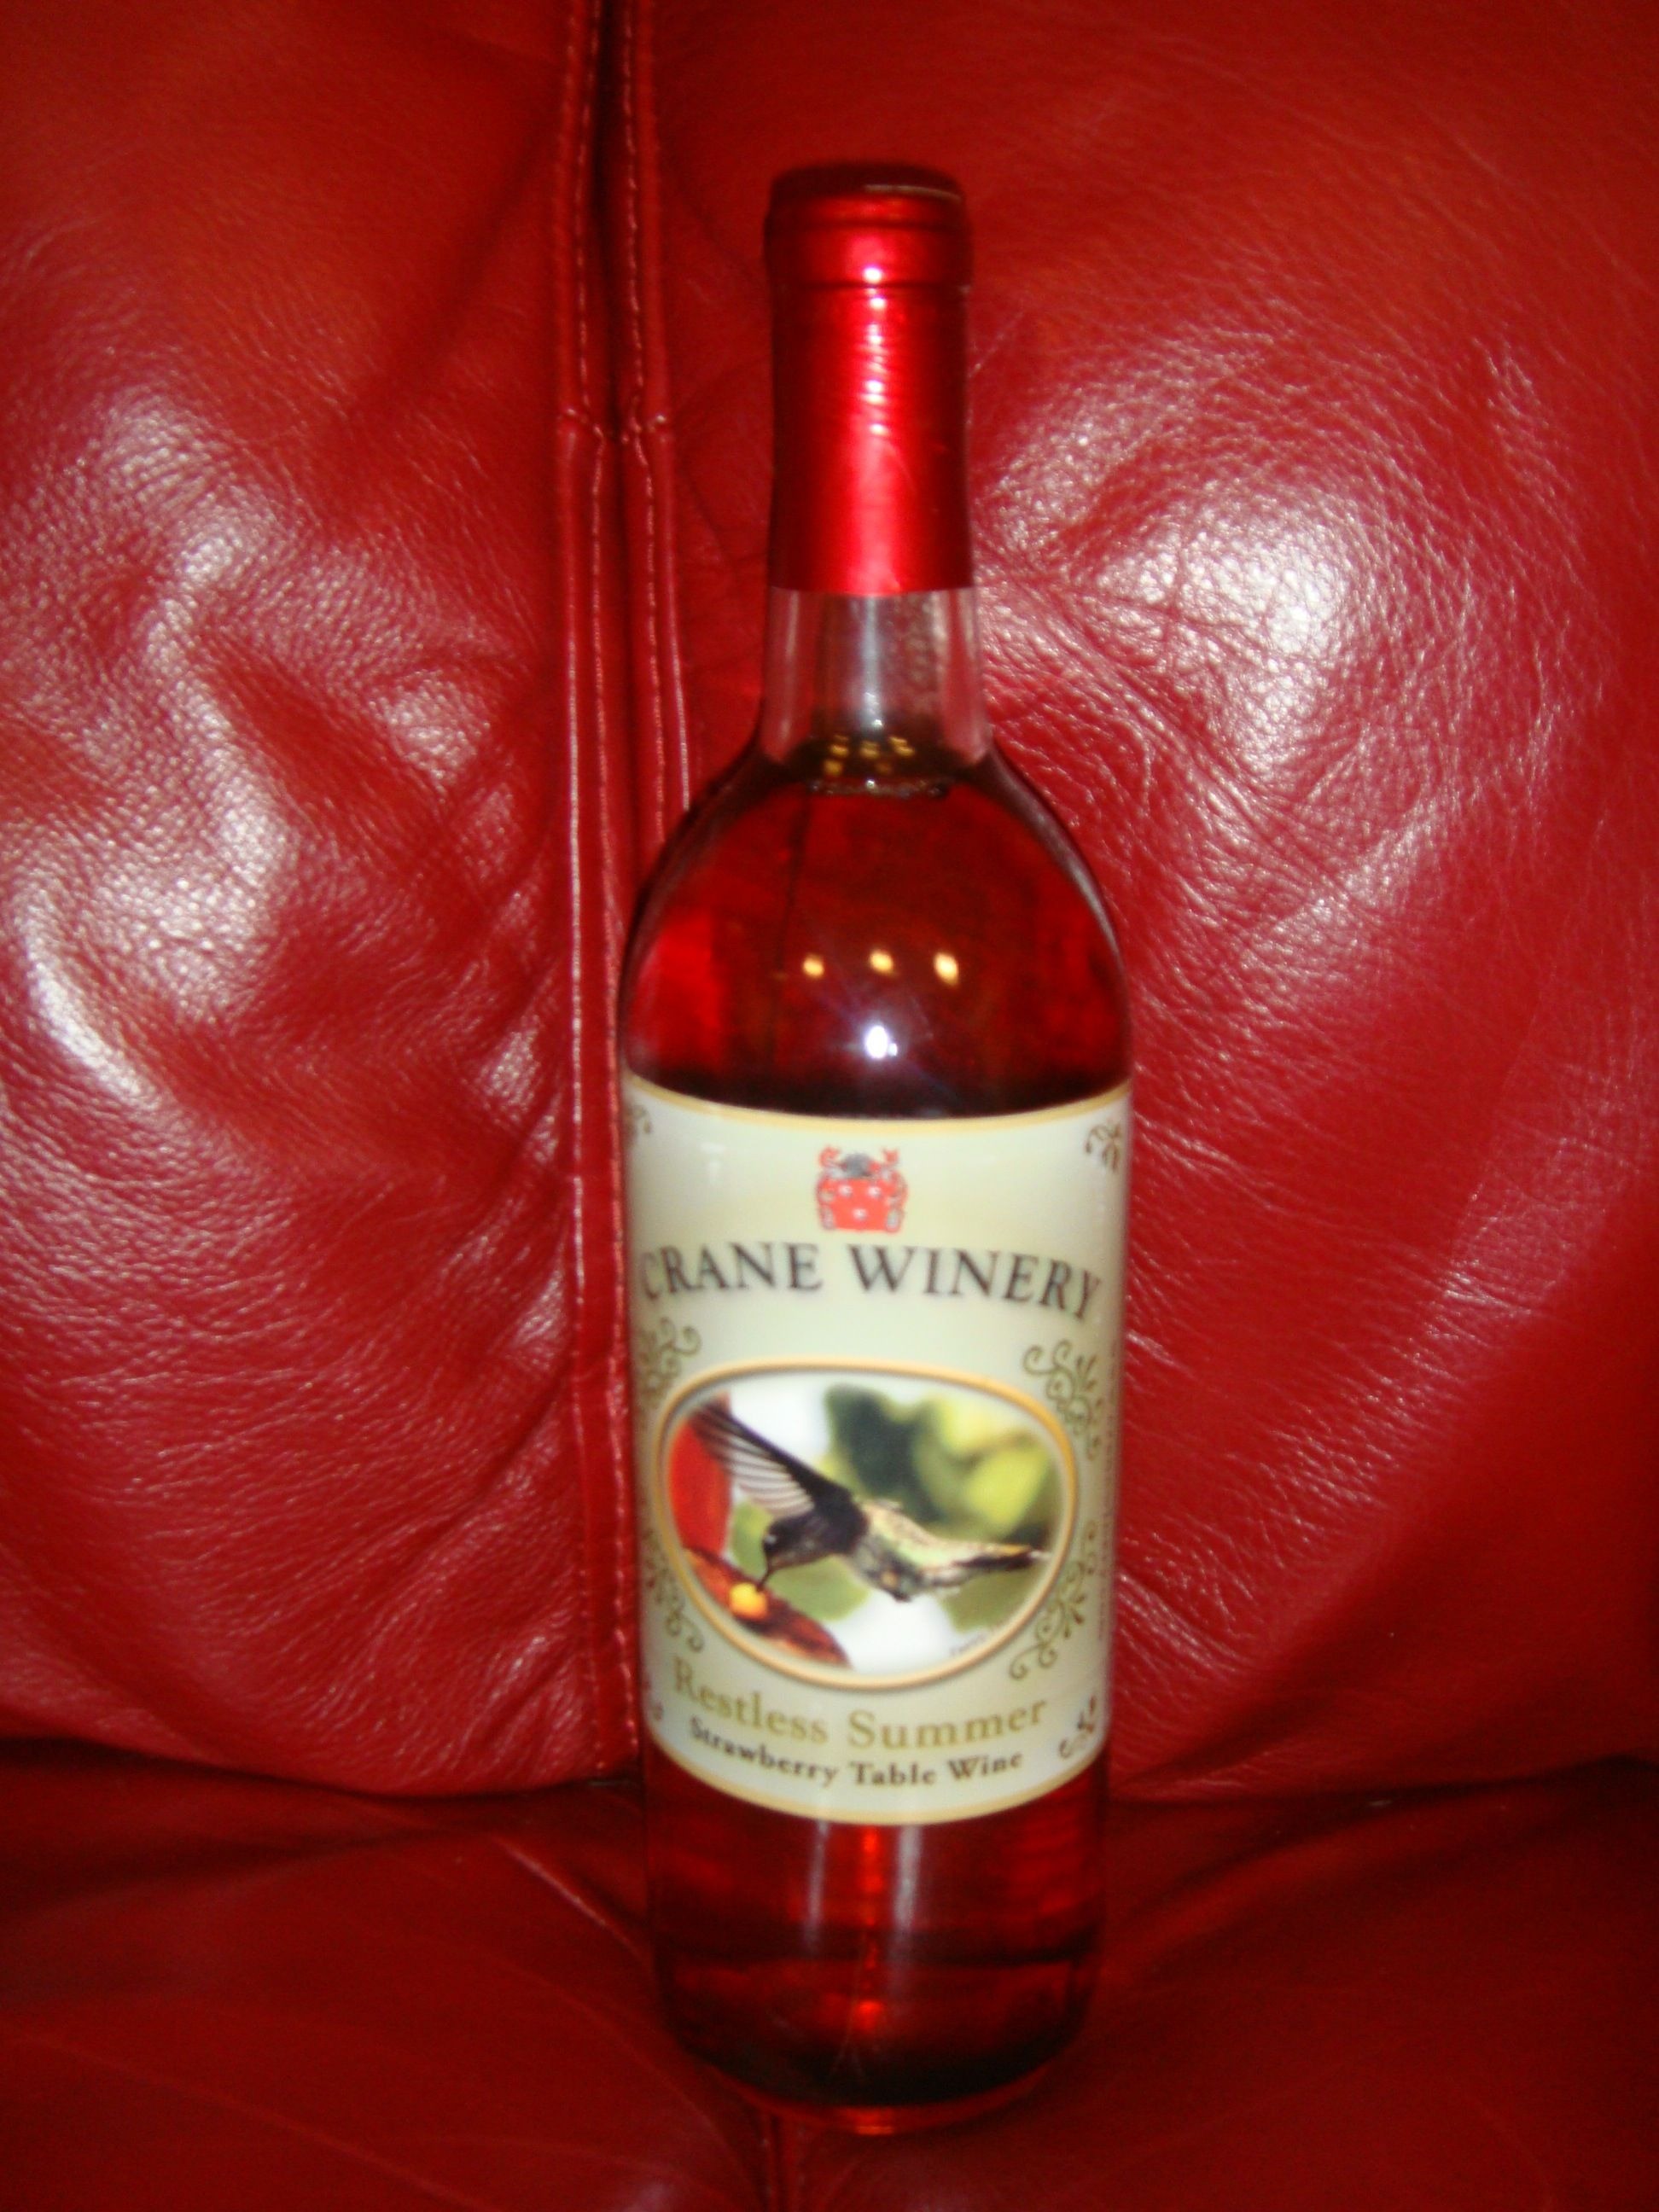 Restless Summer Strawberry Table Wine By Crane Winery In Selma Ia Wine Bottle Wine Winery